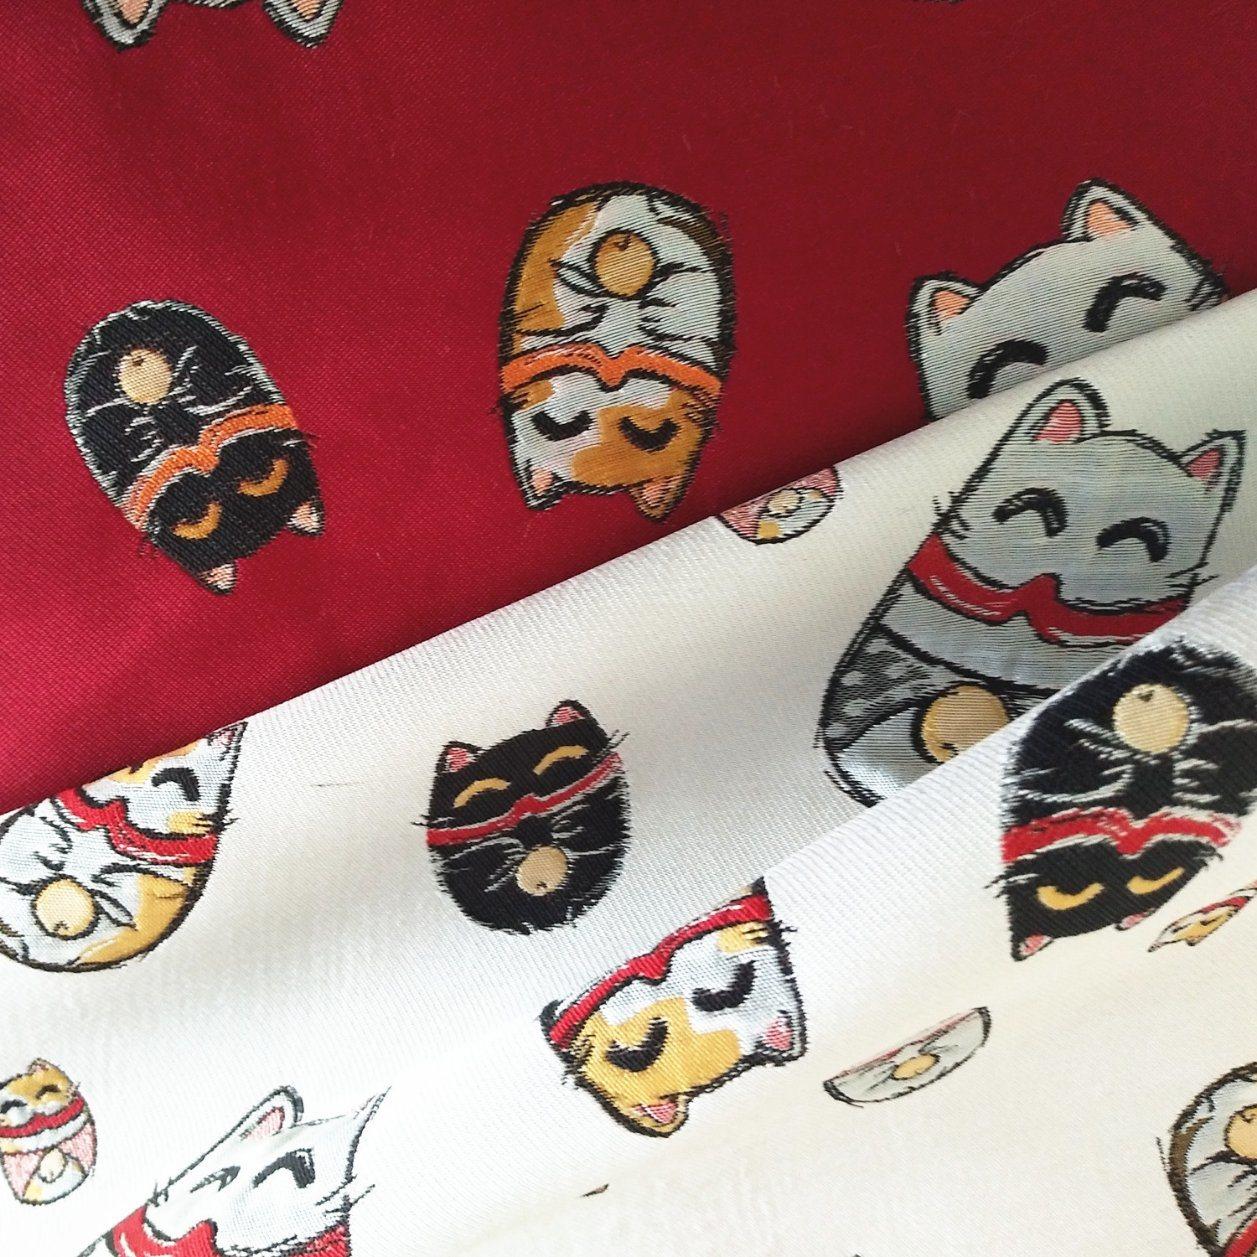 New Fashion Yarn Dyed Fabric Animal Motifs Jacquard Fabric